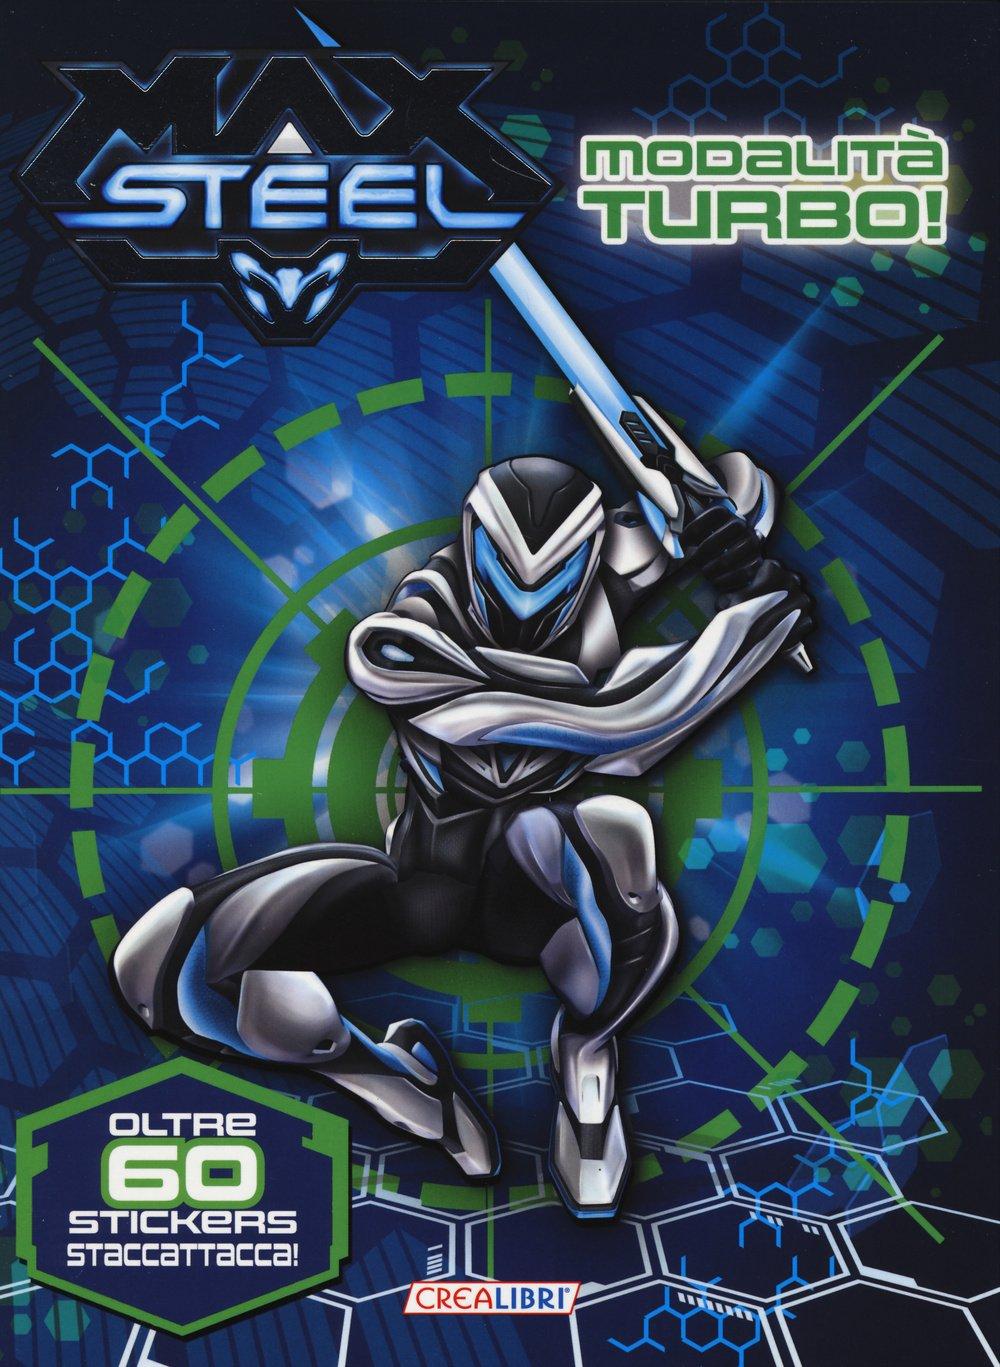 Modalità turbo! Max Steel. Con adesivi. Ediz. illustrata: Amazon.es: Libros en idiomas extranjeros